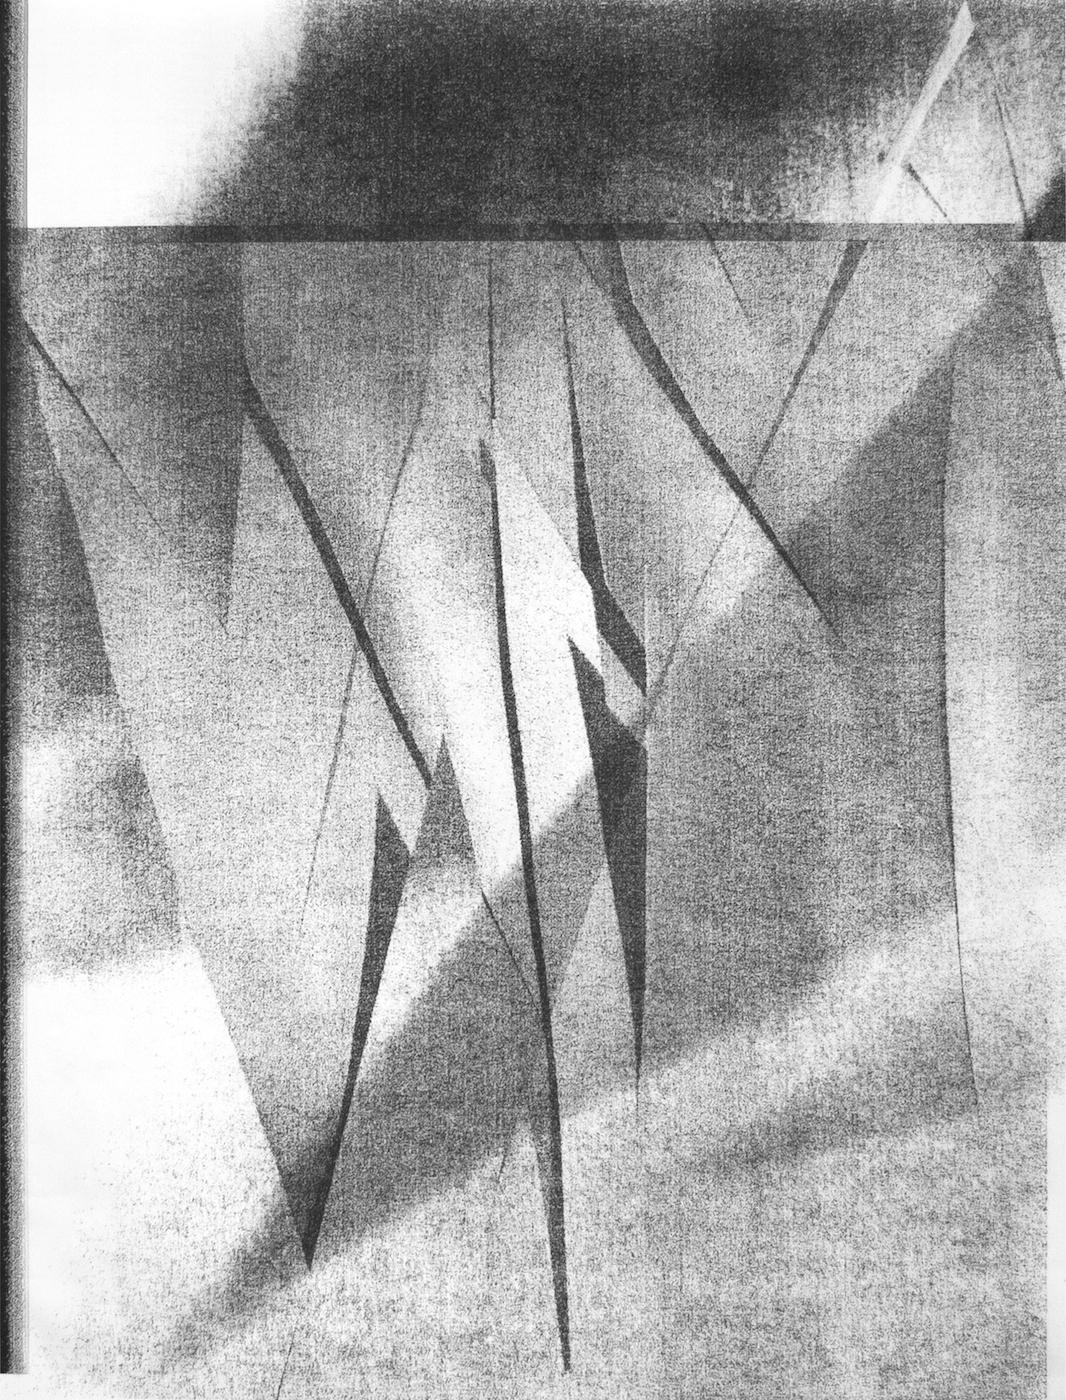 Ghost , 2014  multi-layer inkjet print on matte paper (unique)  56.25 x 42, 143 x 107 cm